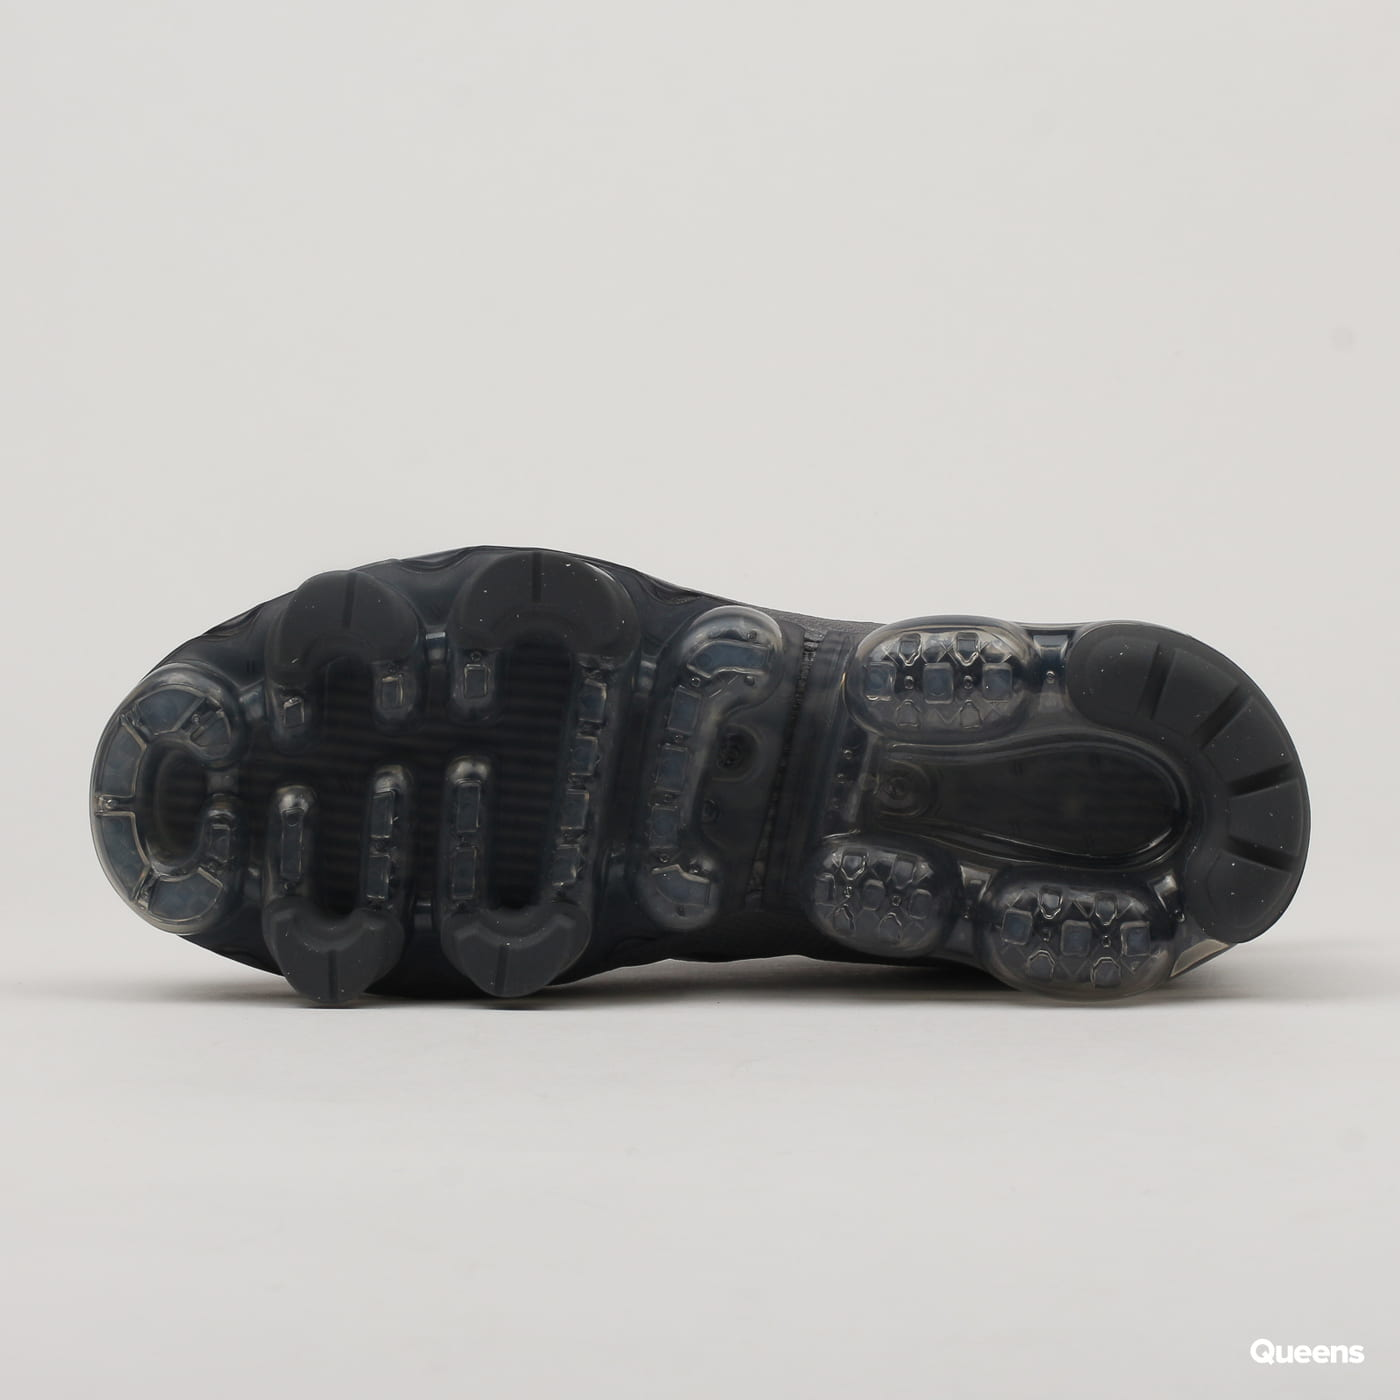 Nike Air Vapormax 2019 (GS) black / black - black